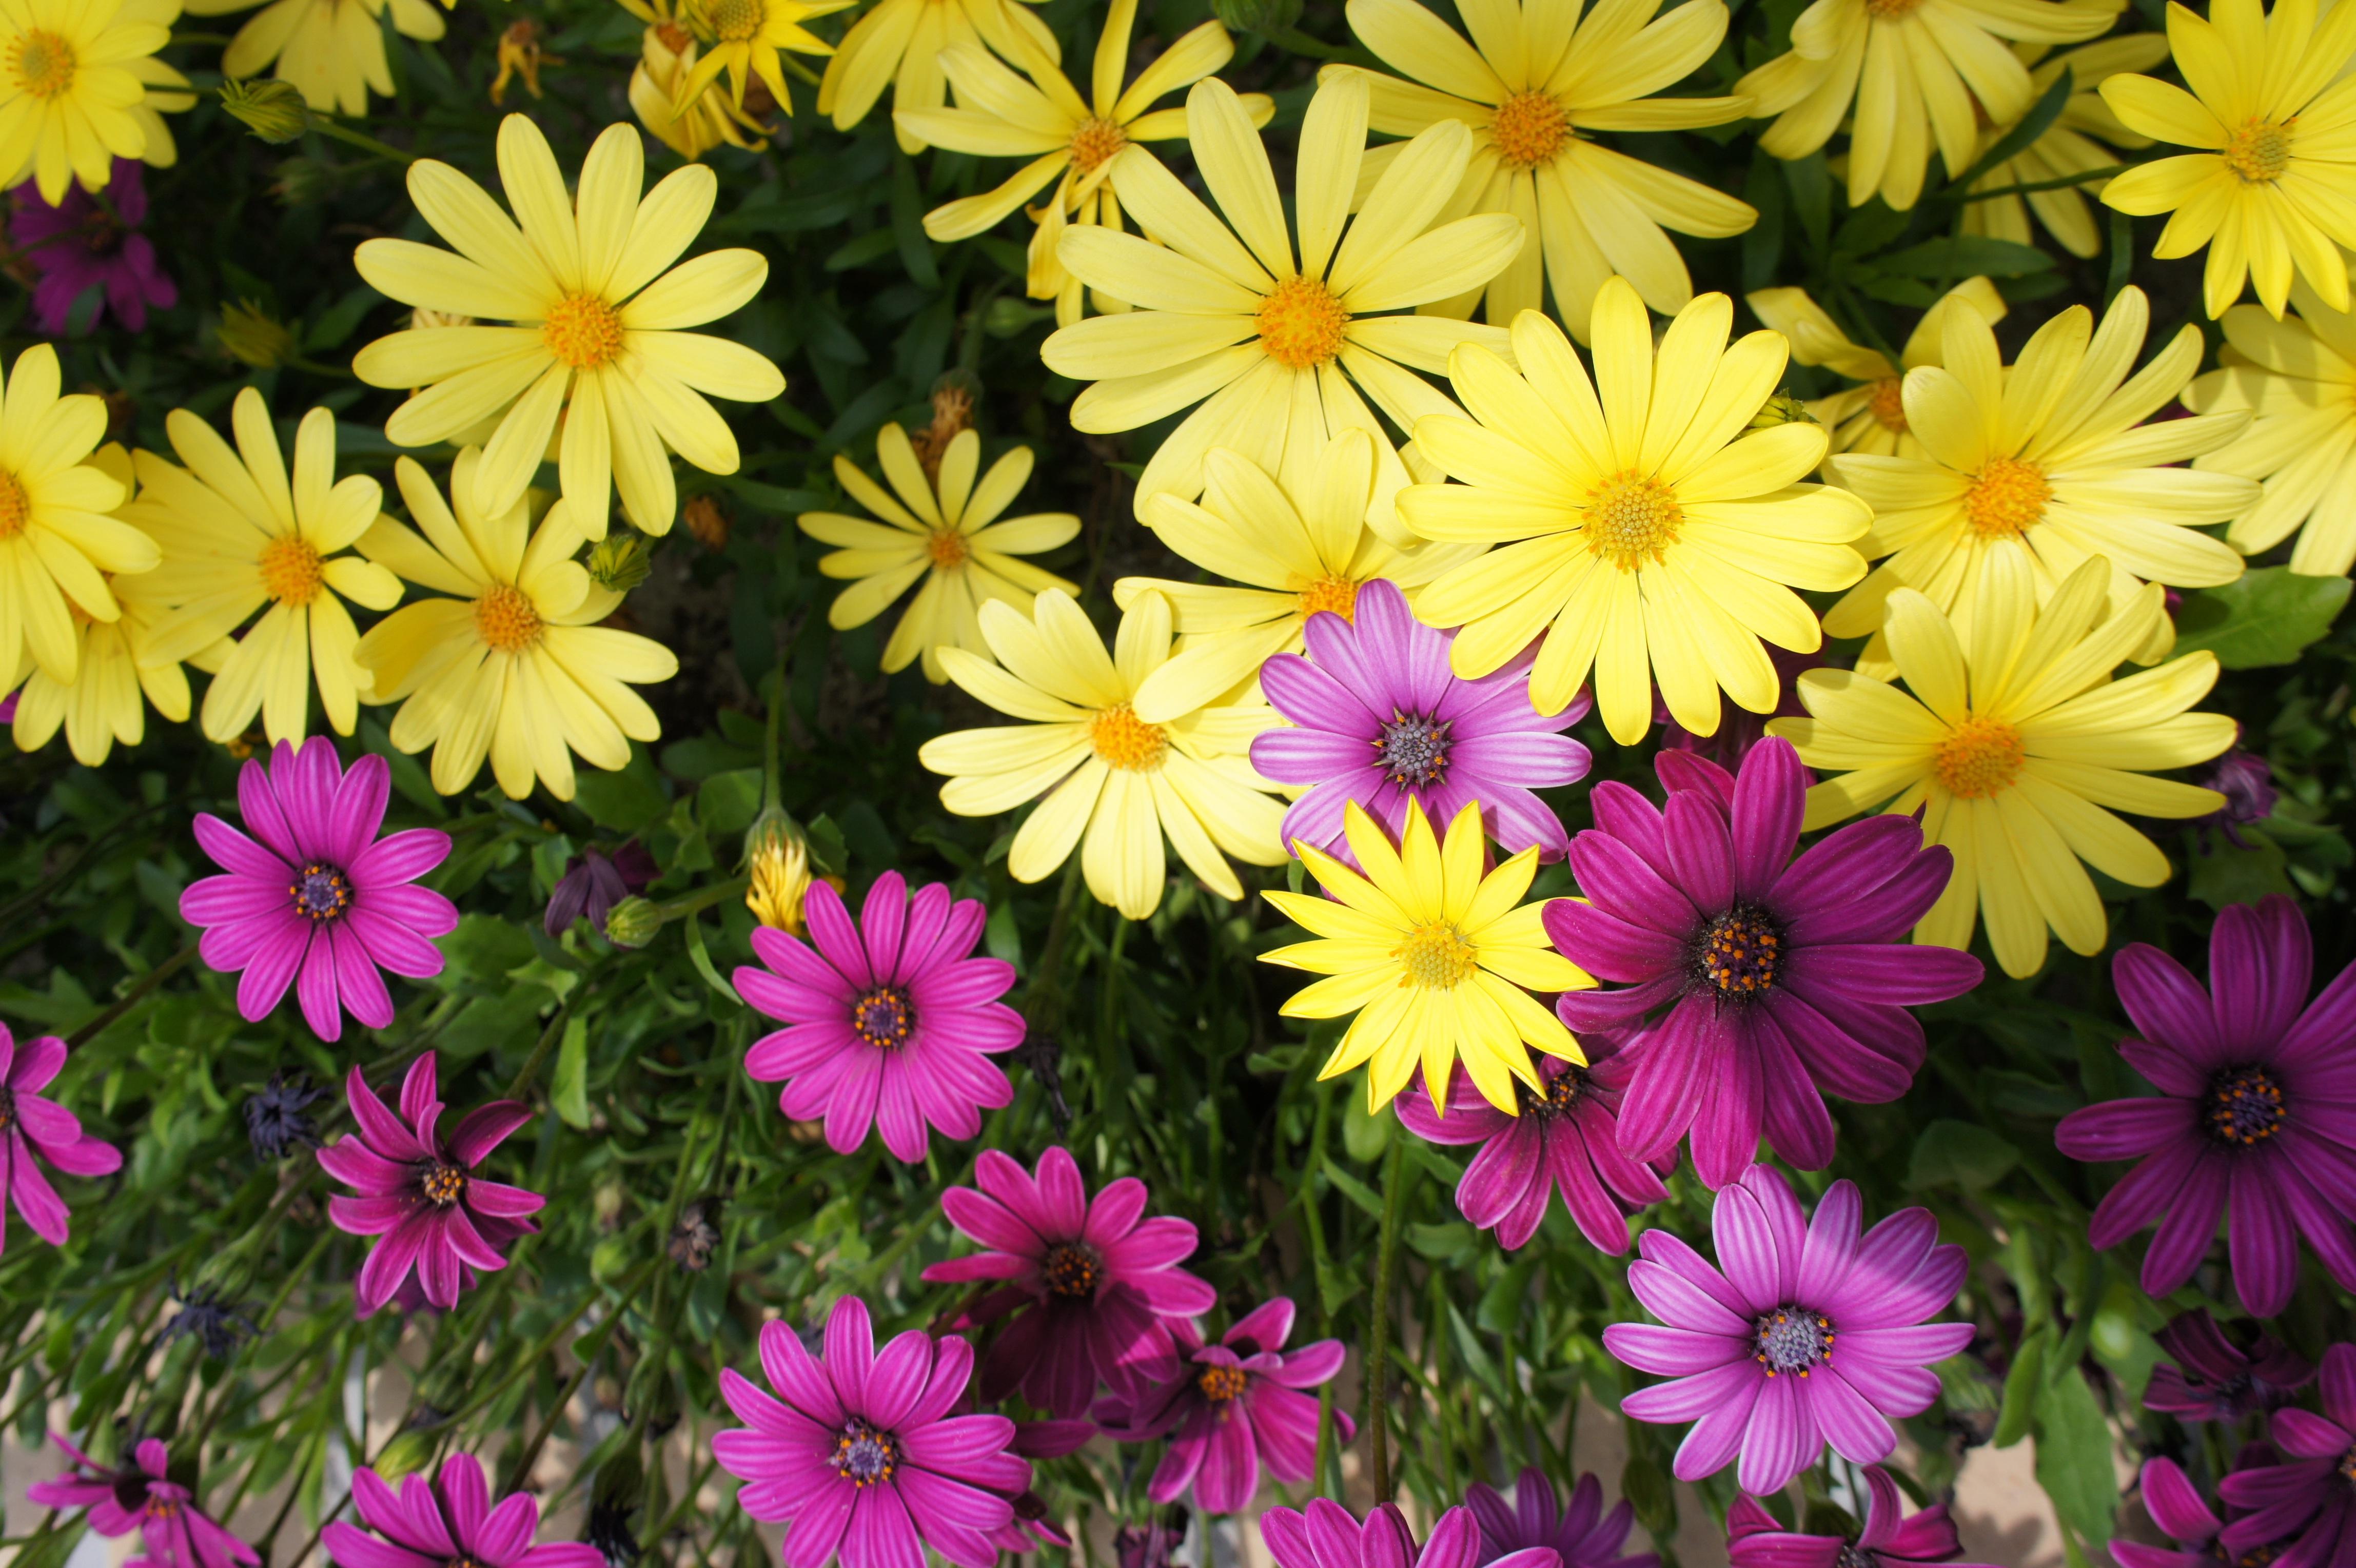 Free Images Petal Yellow Flora Purple Flowers Aster Flower